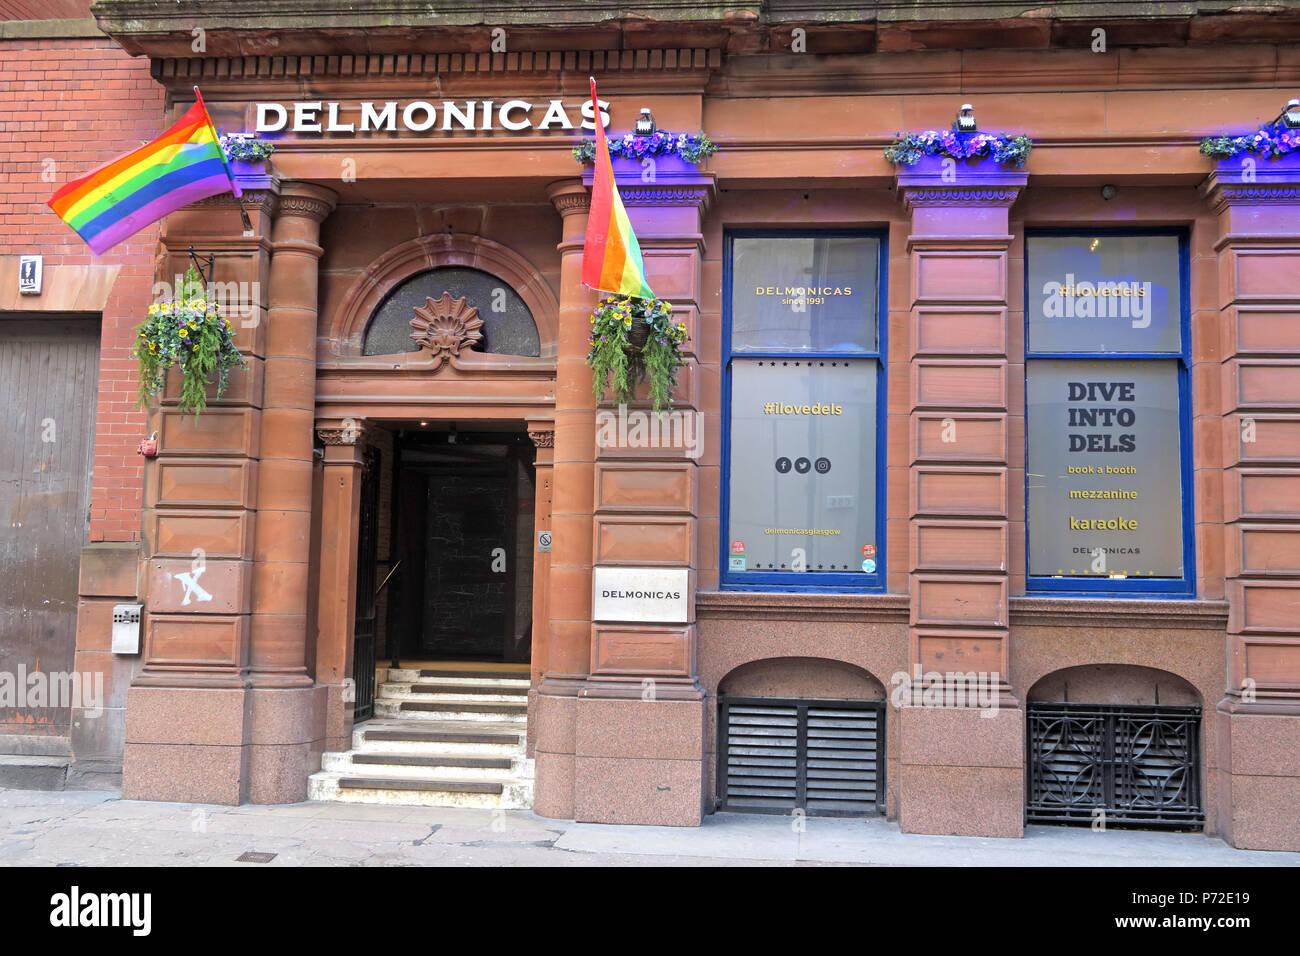 HotpixUK,GoTonySmith,club,pub,LGBT,Gay,Bar,Virginia St,UK,G1 1TX,G1,Virginia Street,rainbow,flag,outside,exterior,dive into dels,dive,Dels,homosexual,Lesbian,scene,gay scene,trans,Bi,karaoke,quizzes,DJ party,quiz,DJ,party,local gay community,community,tourist,entertainment,Merchant City,best,best gay bar,nightlife,drag show